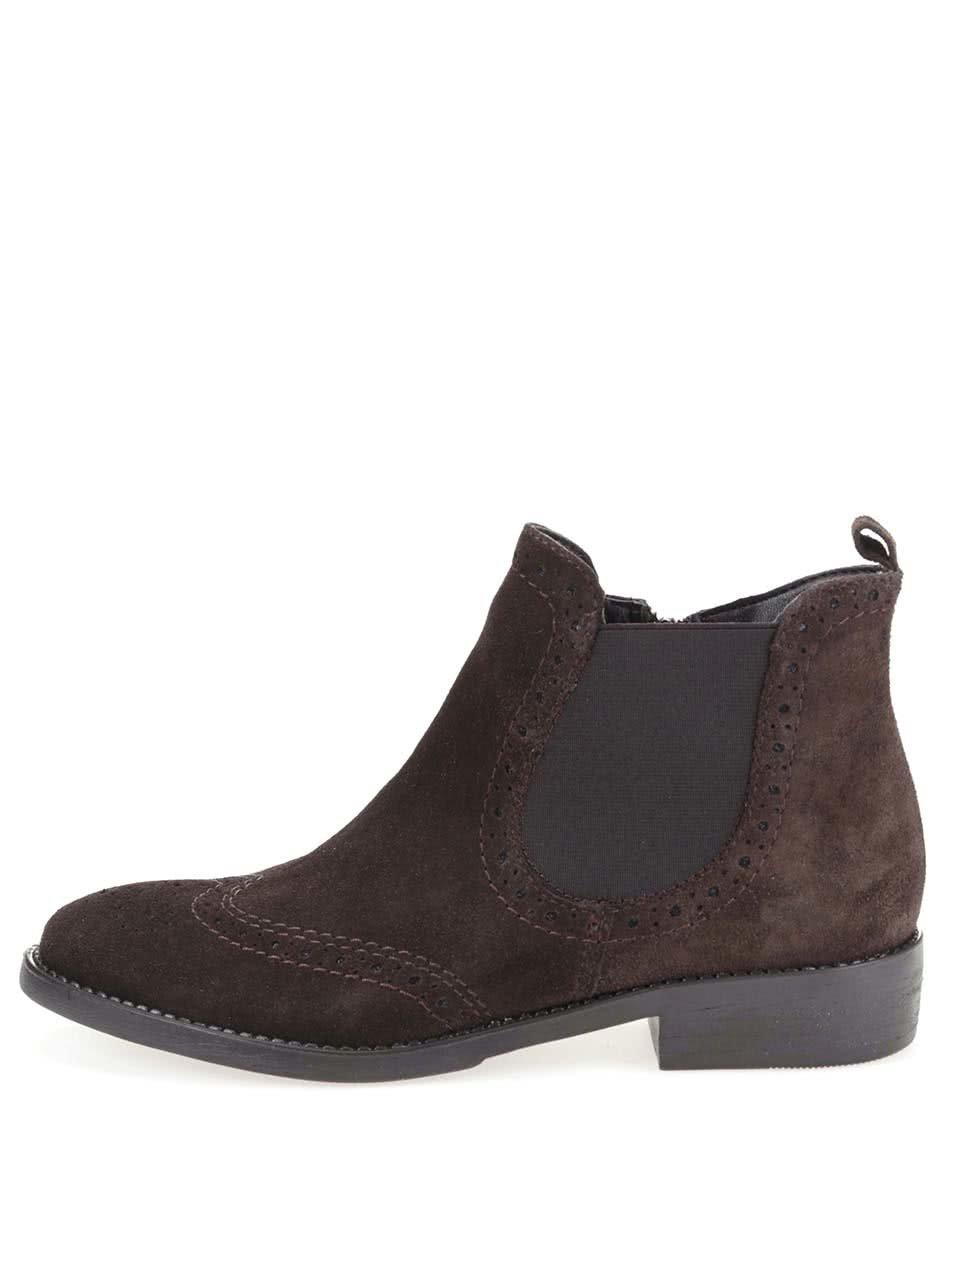 Tmavě hnědé kožené kotníkové brogue boty Tamaris